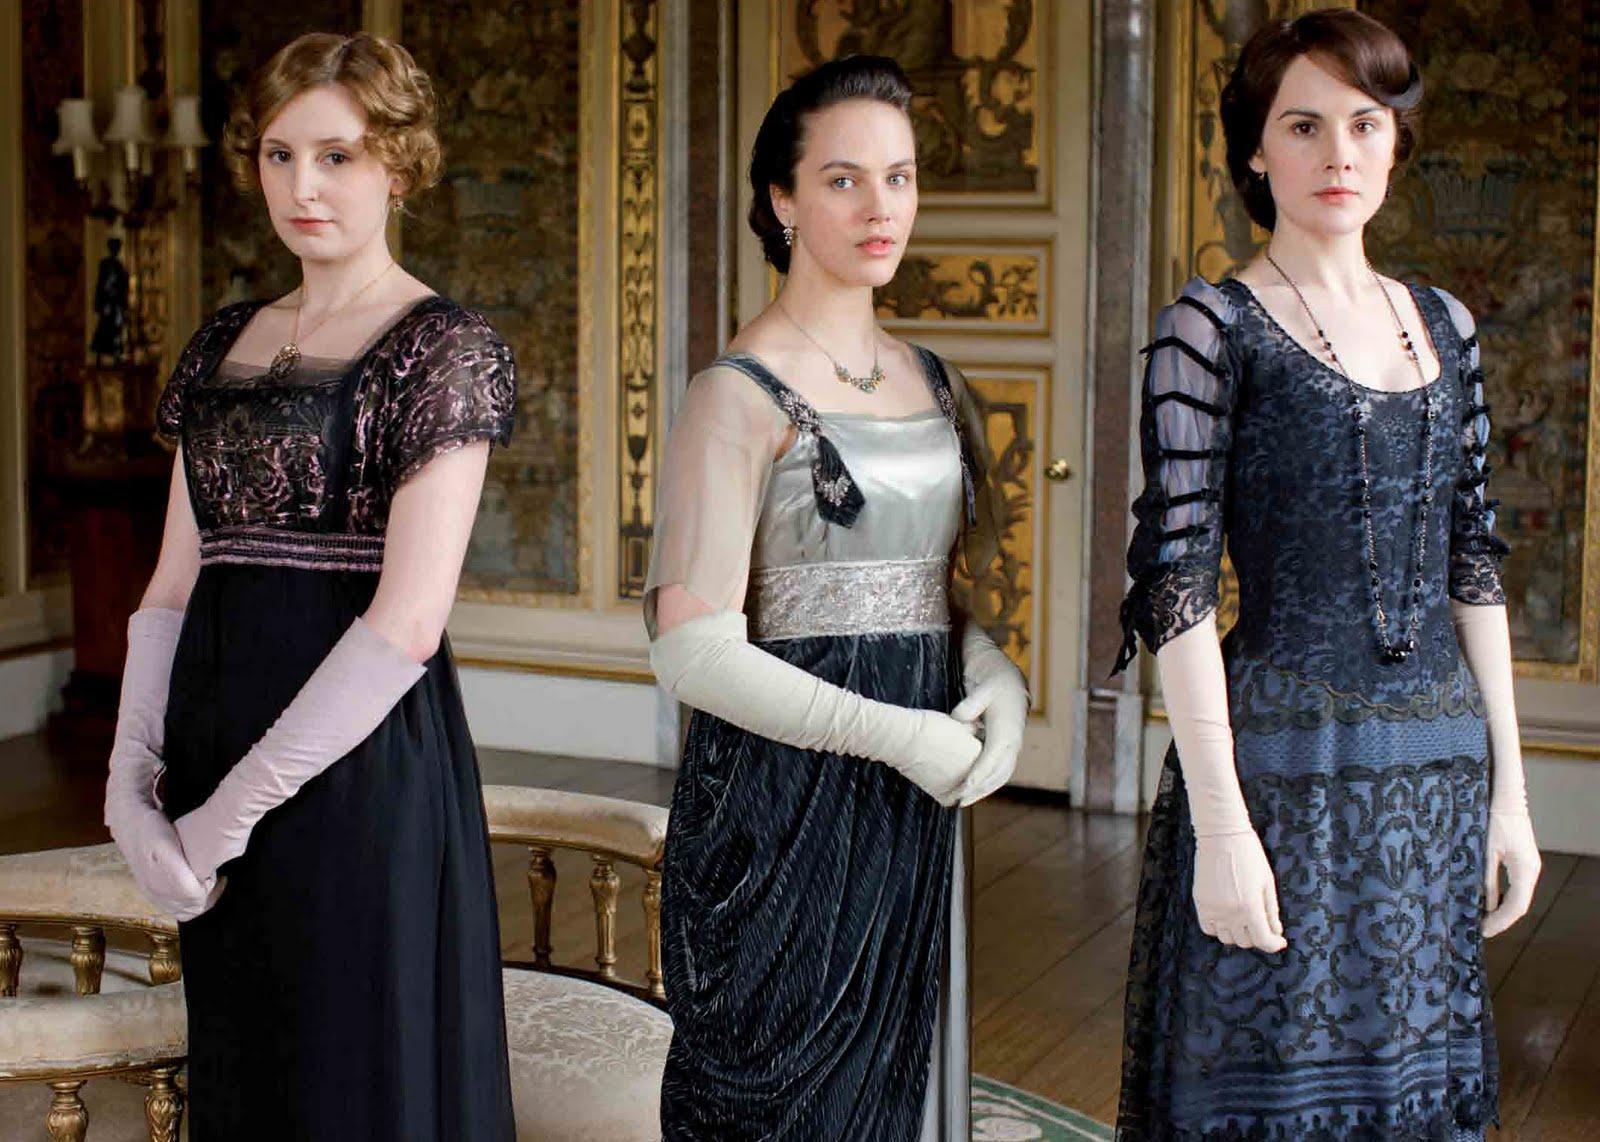 http://1.bp.blogspot.com/-tqDMNX3qvCk/ToHN2N-714I/AAAAAAAAAc4/qASGdgQXdEY/s1600/The+sisters+Crawley-+Lady+Edith%252C+Lady+Mary+and+Lady+Sybil%252C+season+2.jpg